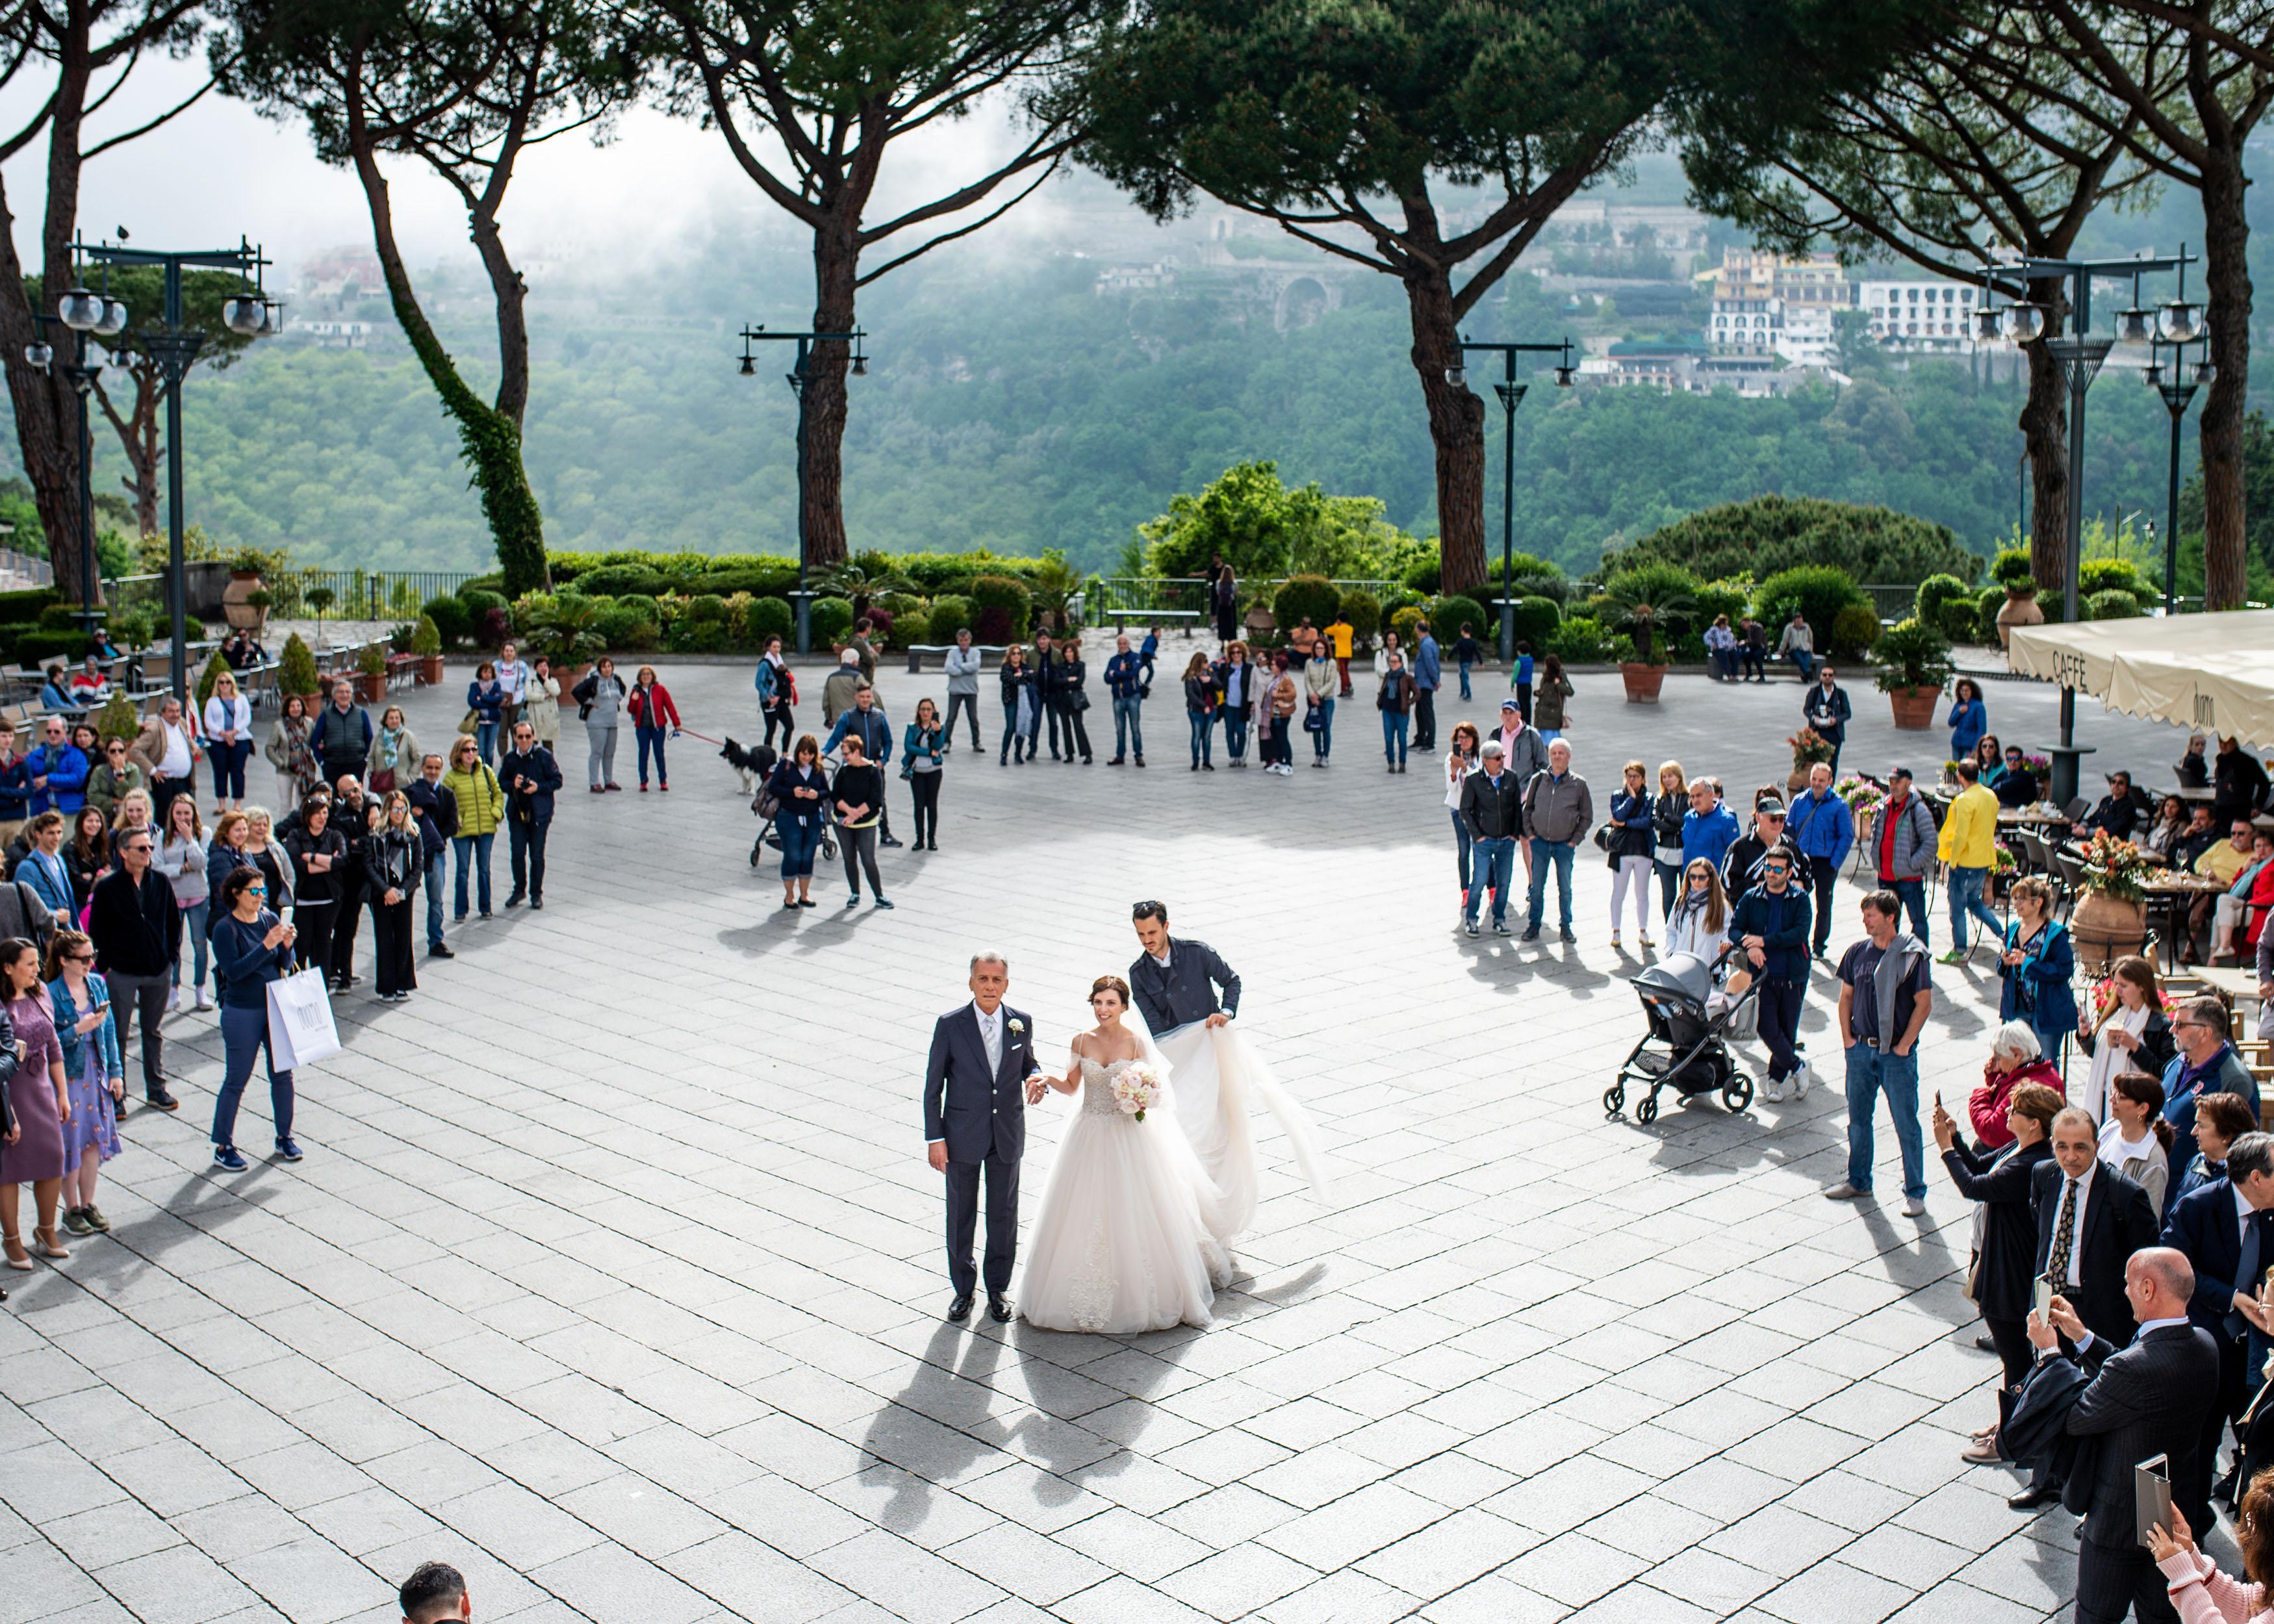 http://www.weddingamalfi.com/wp-content/uploads/Katia-Jorge-18-maggio-2019-22.jpg